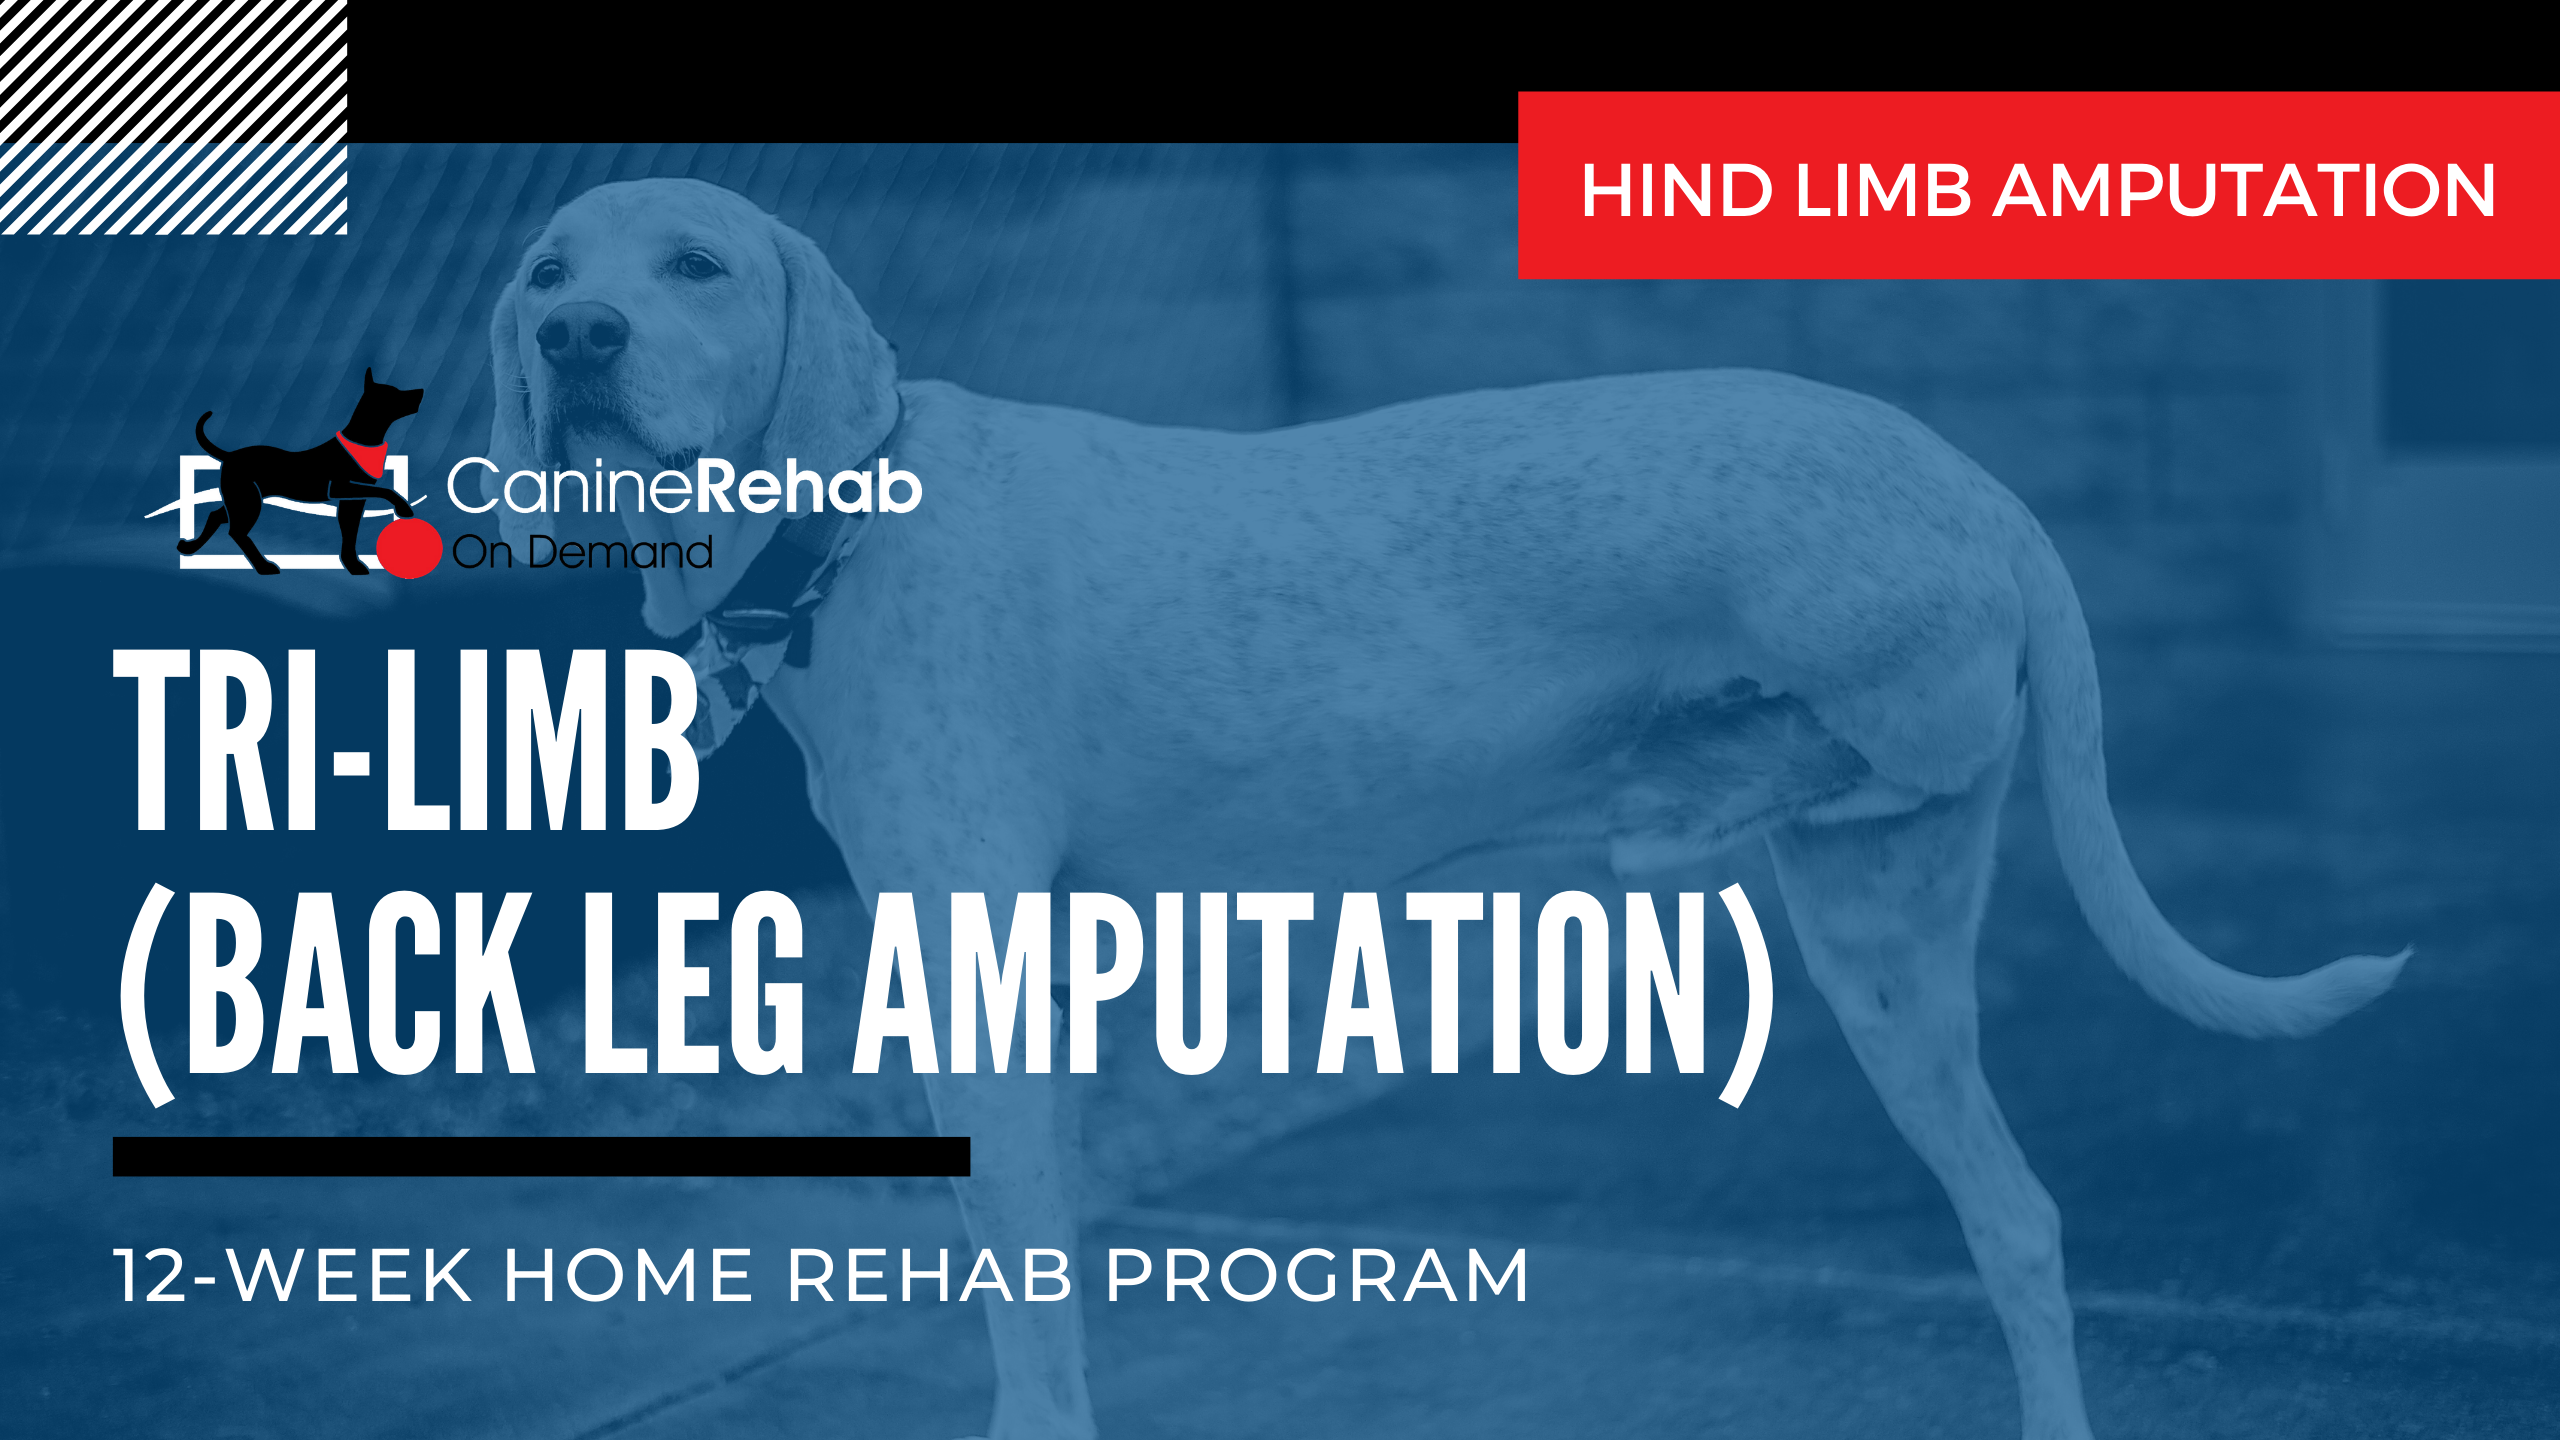 12-Week Home Rehab Program for Back Leg Amputation